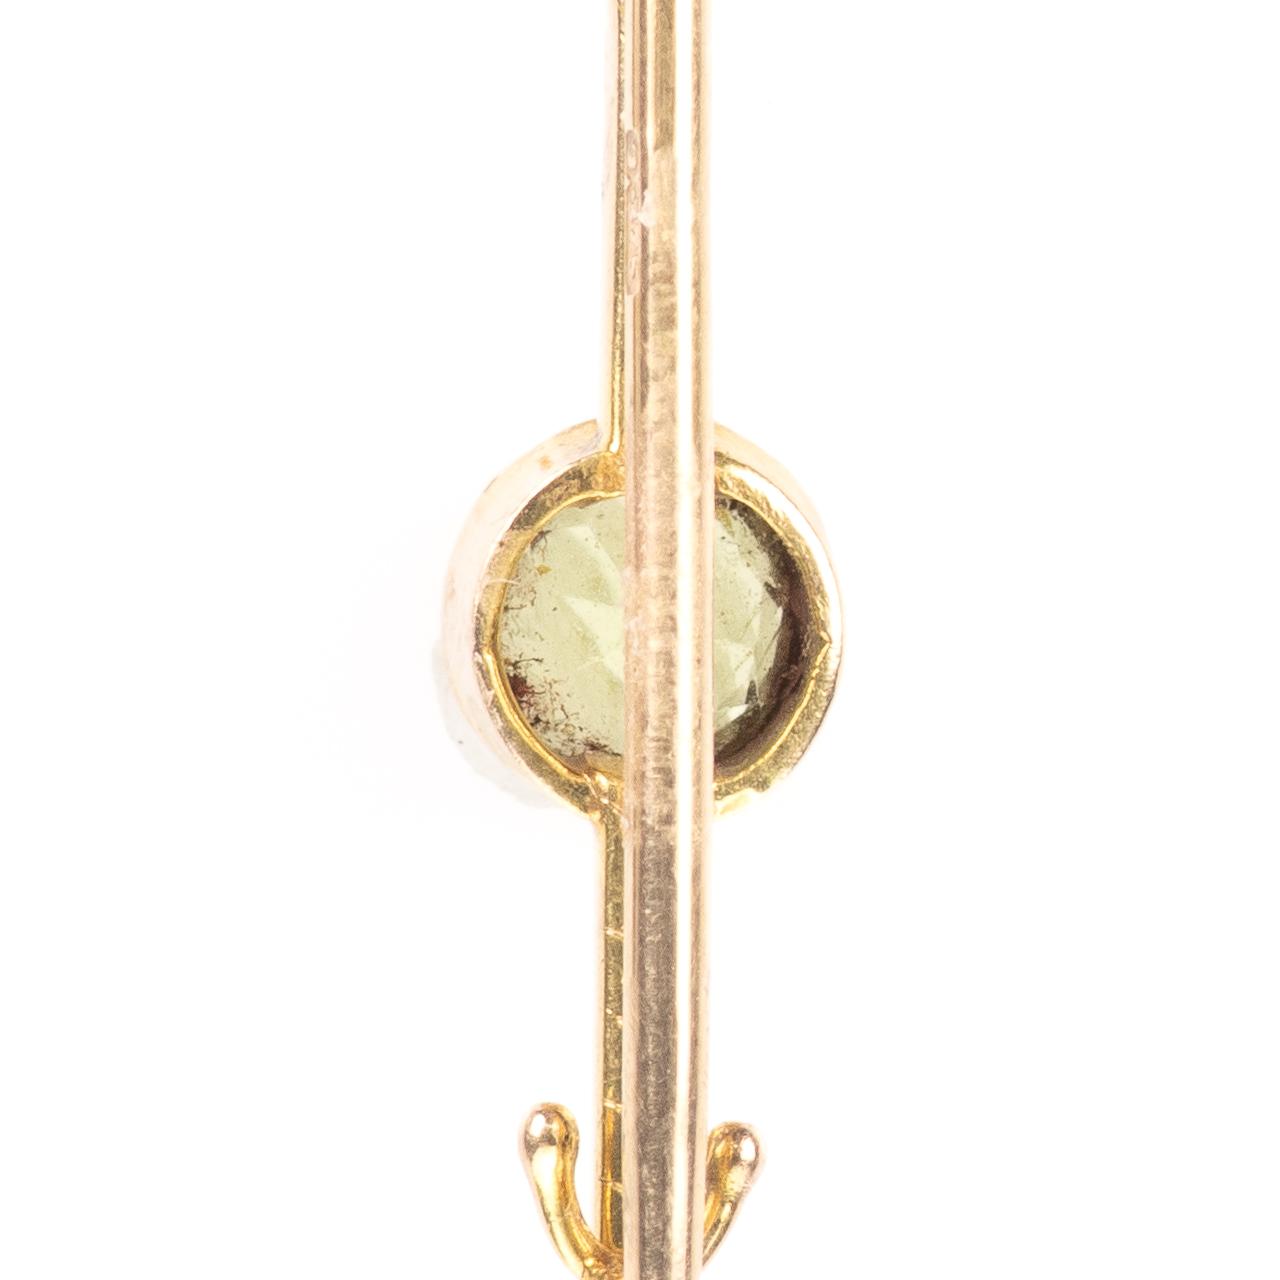 9ct Gold 0.50ct Peridot Brooch Birmingham 1977 Cropp & Farr Ltd - Image 6 of 6